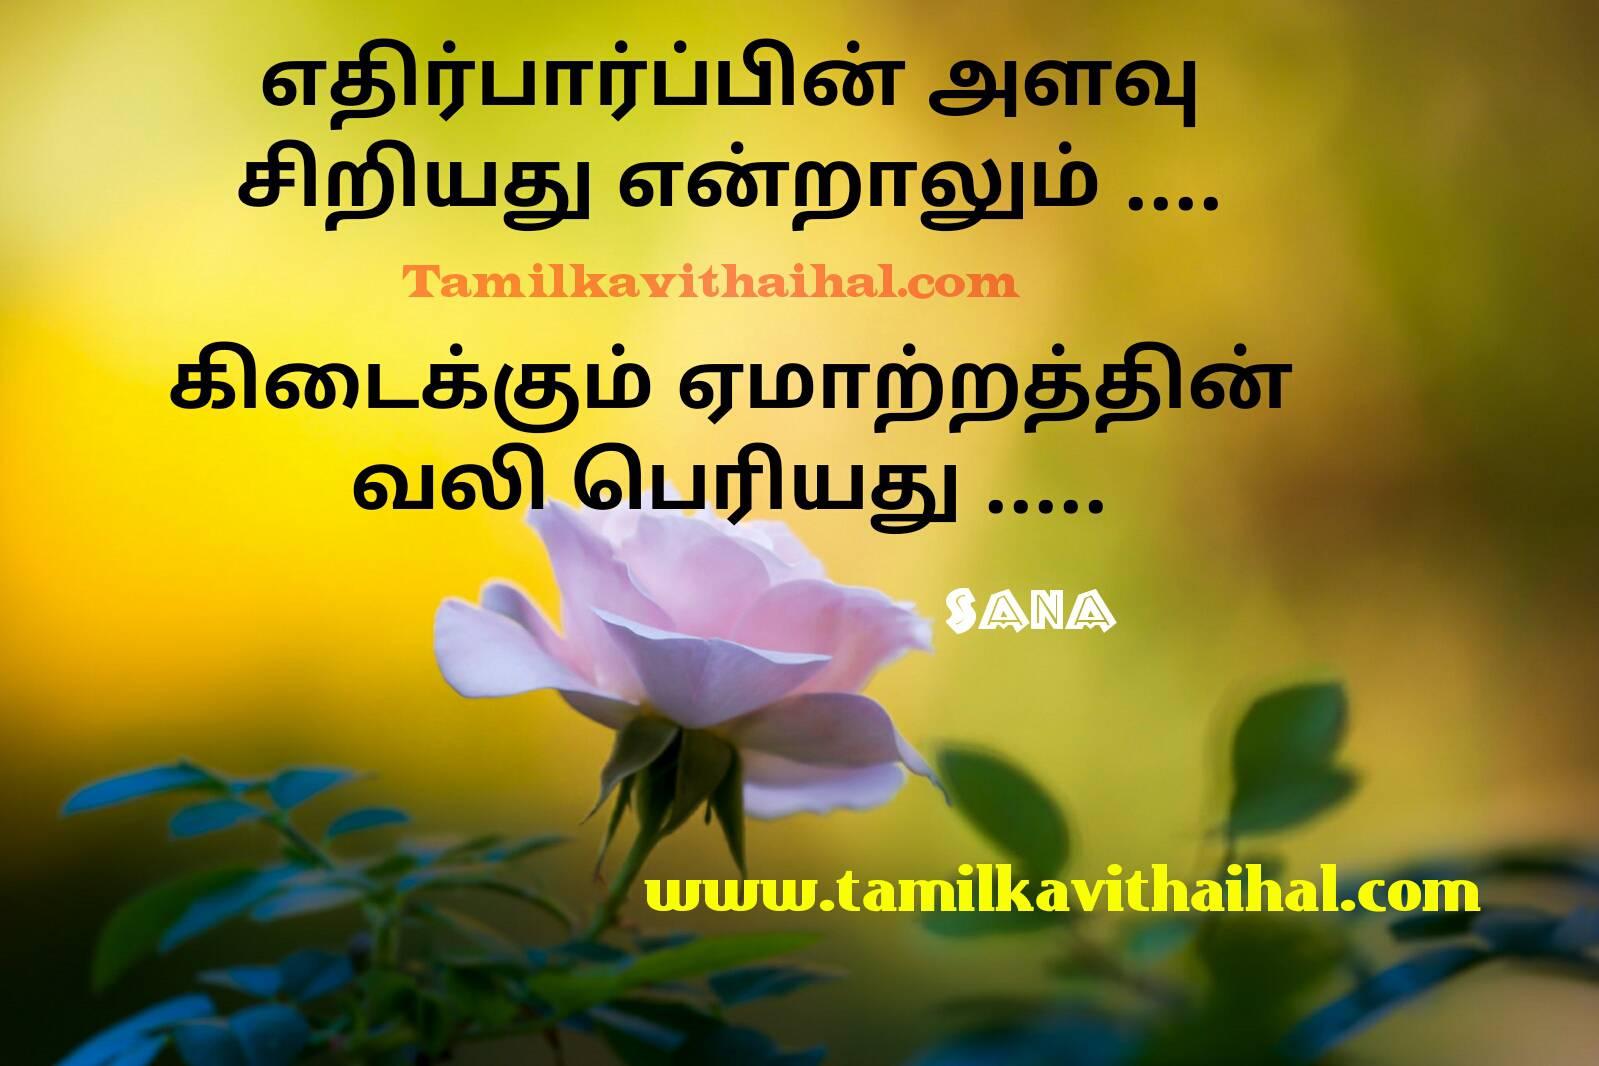 Beautiful tamil valkkai ethirparppu ematram vali periyathu sana thathuvam quotes for life image